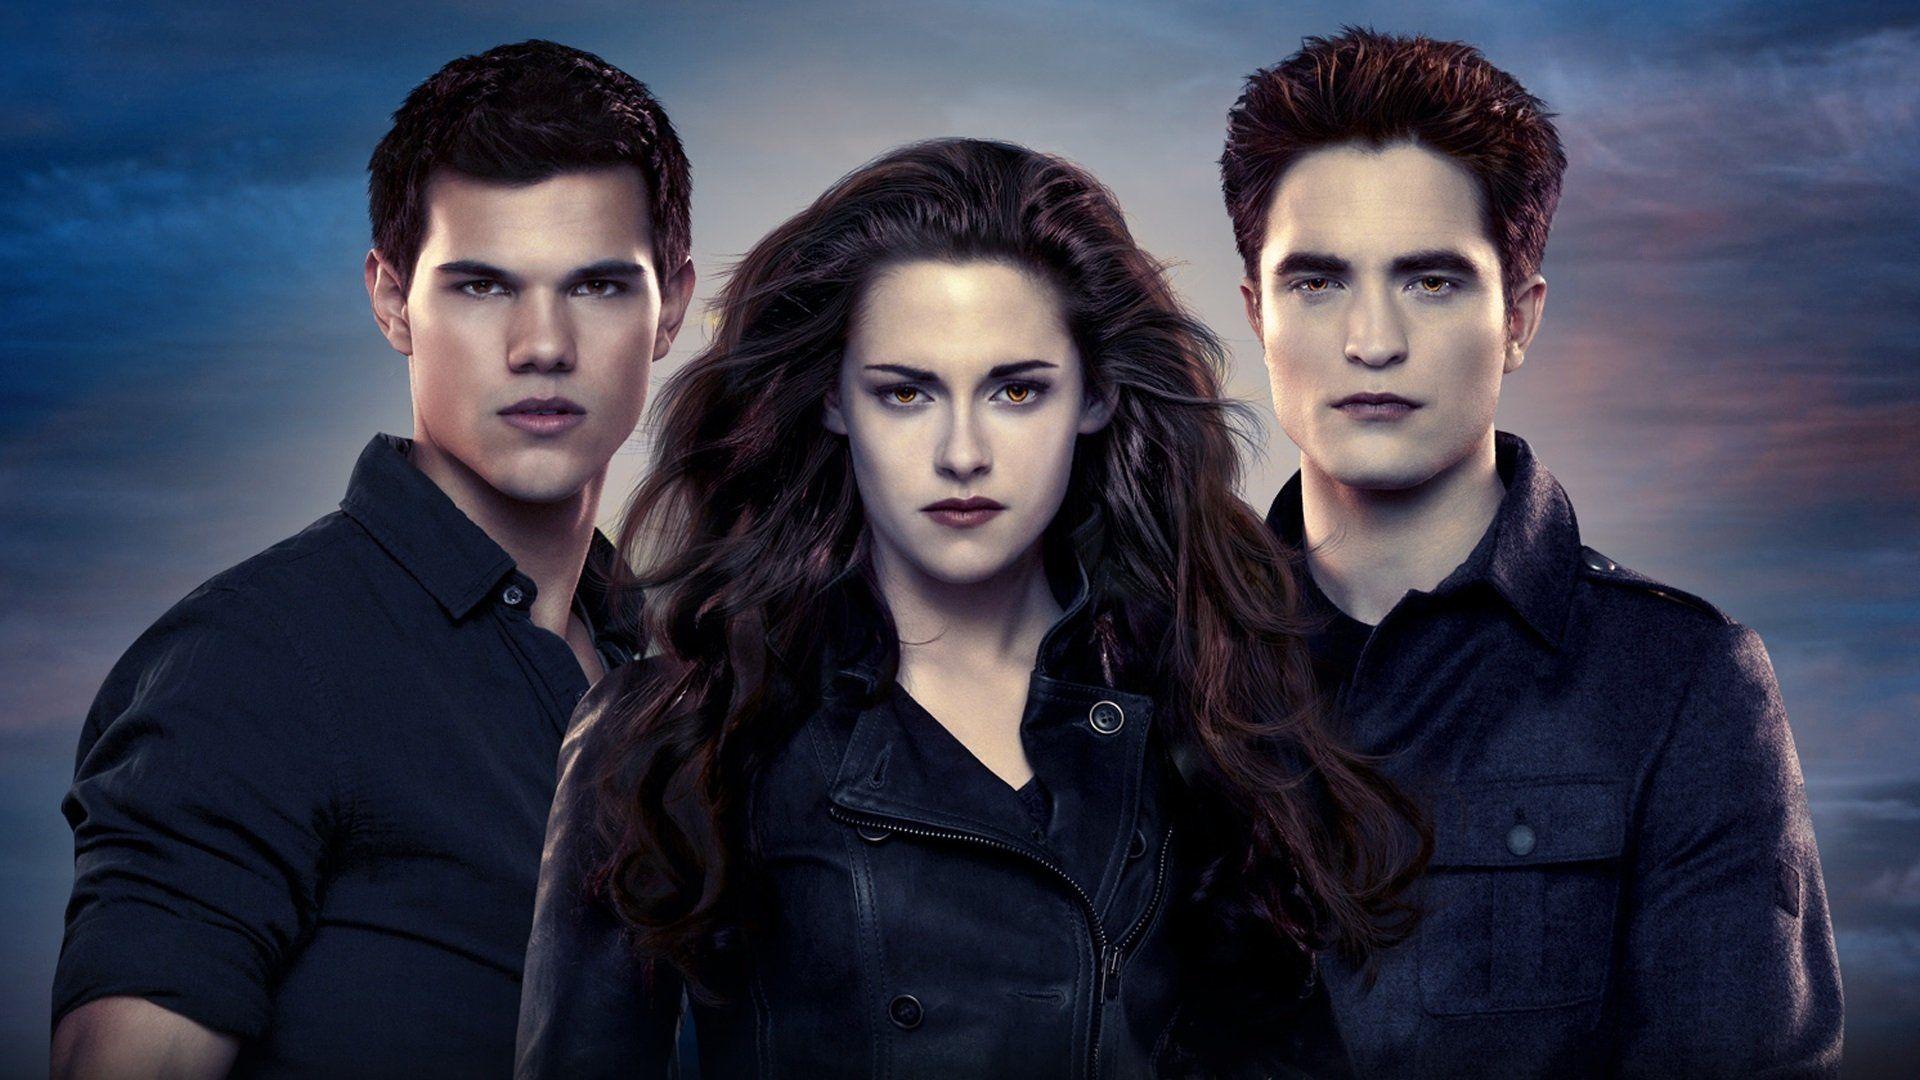 Twilight Edward And Bella Hd Wallpaper Twilight Saga Twilight Movie Scenes Twilight Scenes